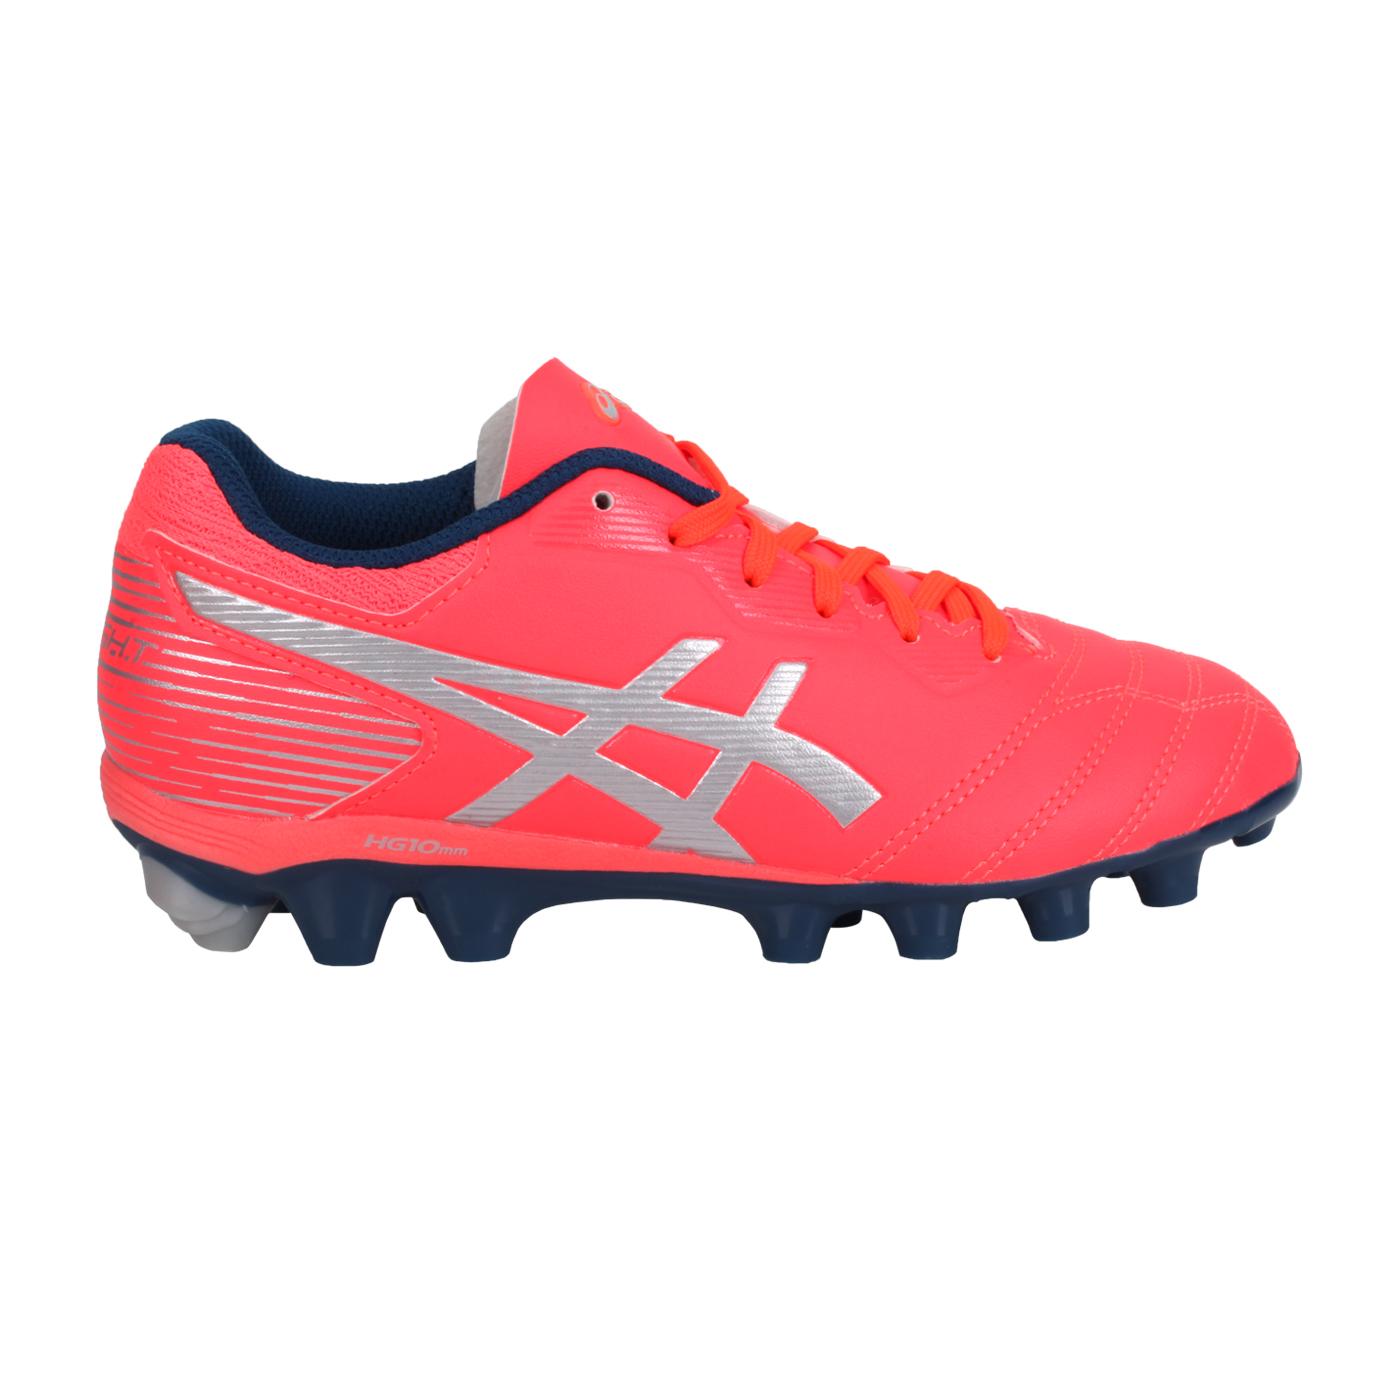 ASICS 中童足球鞋  @DS LIGHT JR GS@1104A019-701 - 螢光粉銀